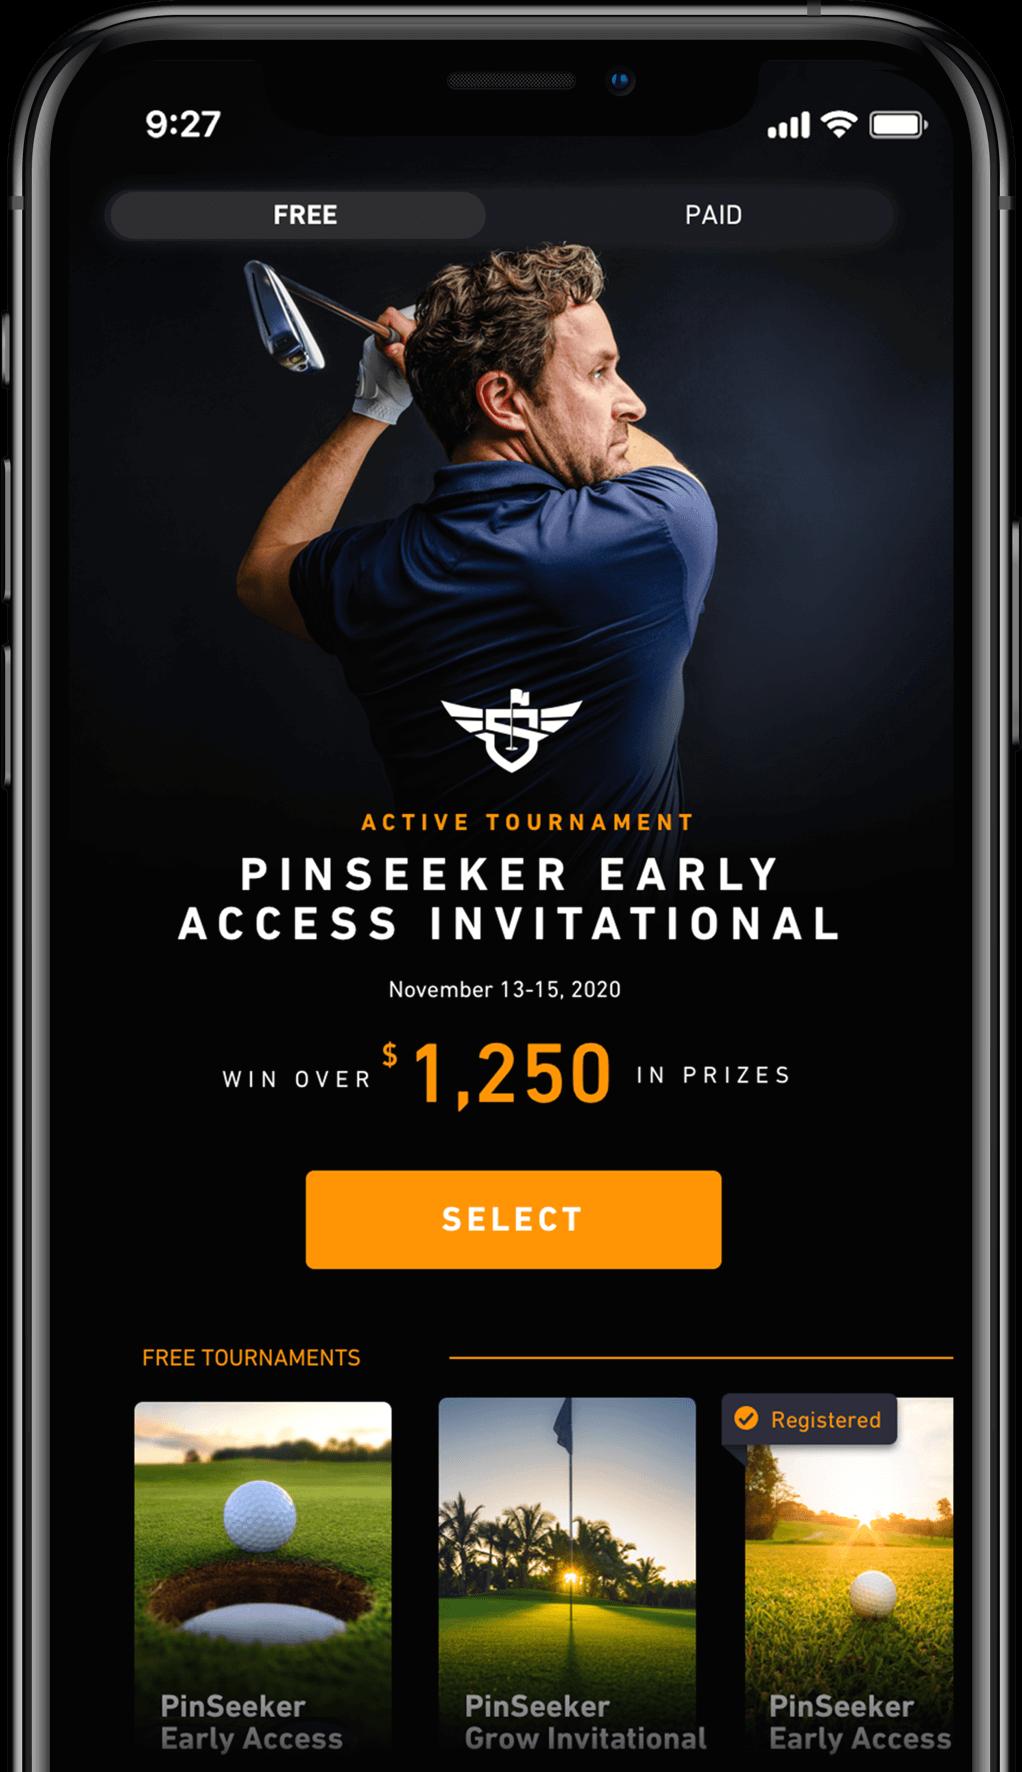 Download the PinSeeker app